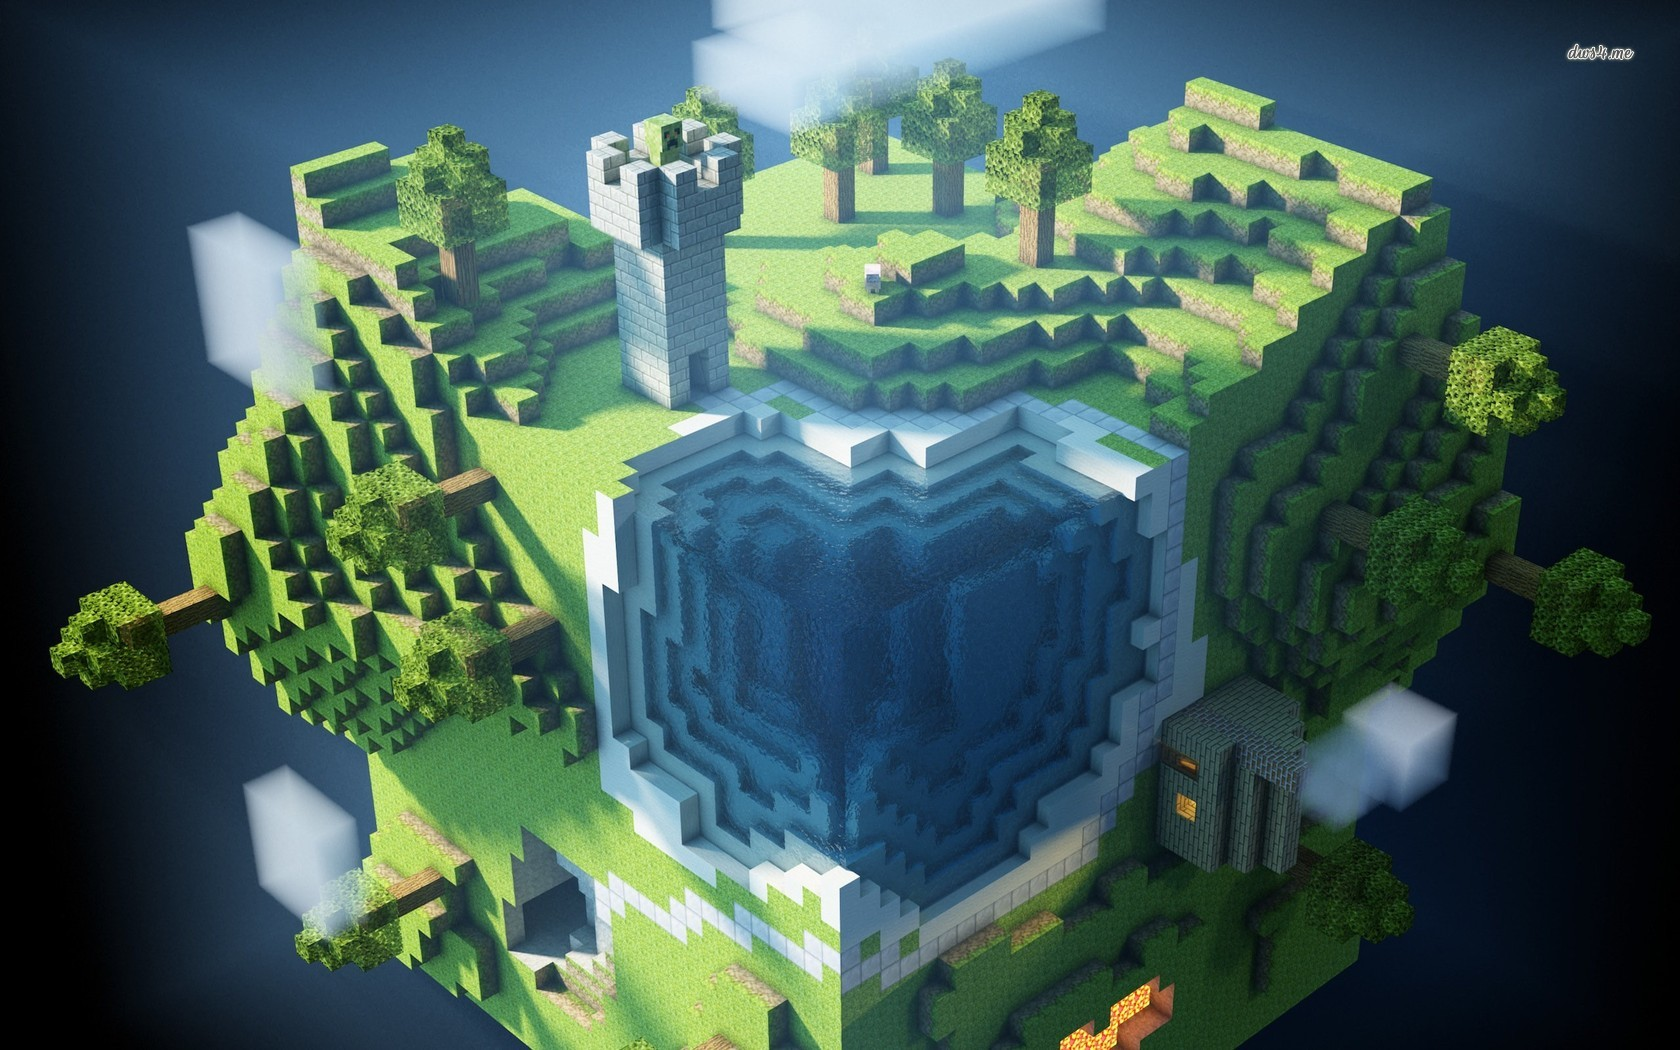 Popular Wallpaper Minecraft Landscape - Minecraft-Wallpapers-1680x1050-027  Photograph_732111.jpg